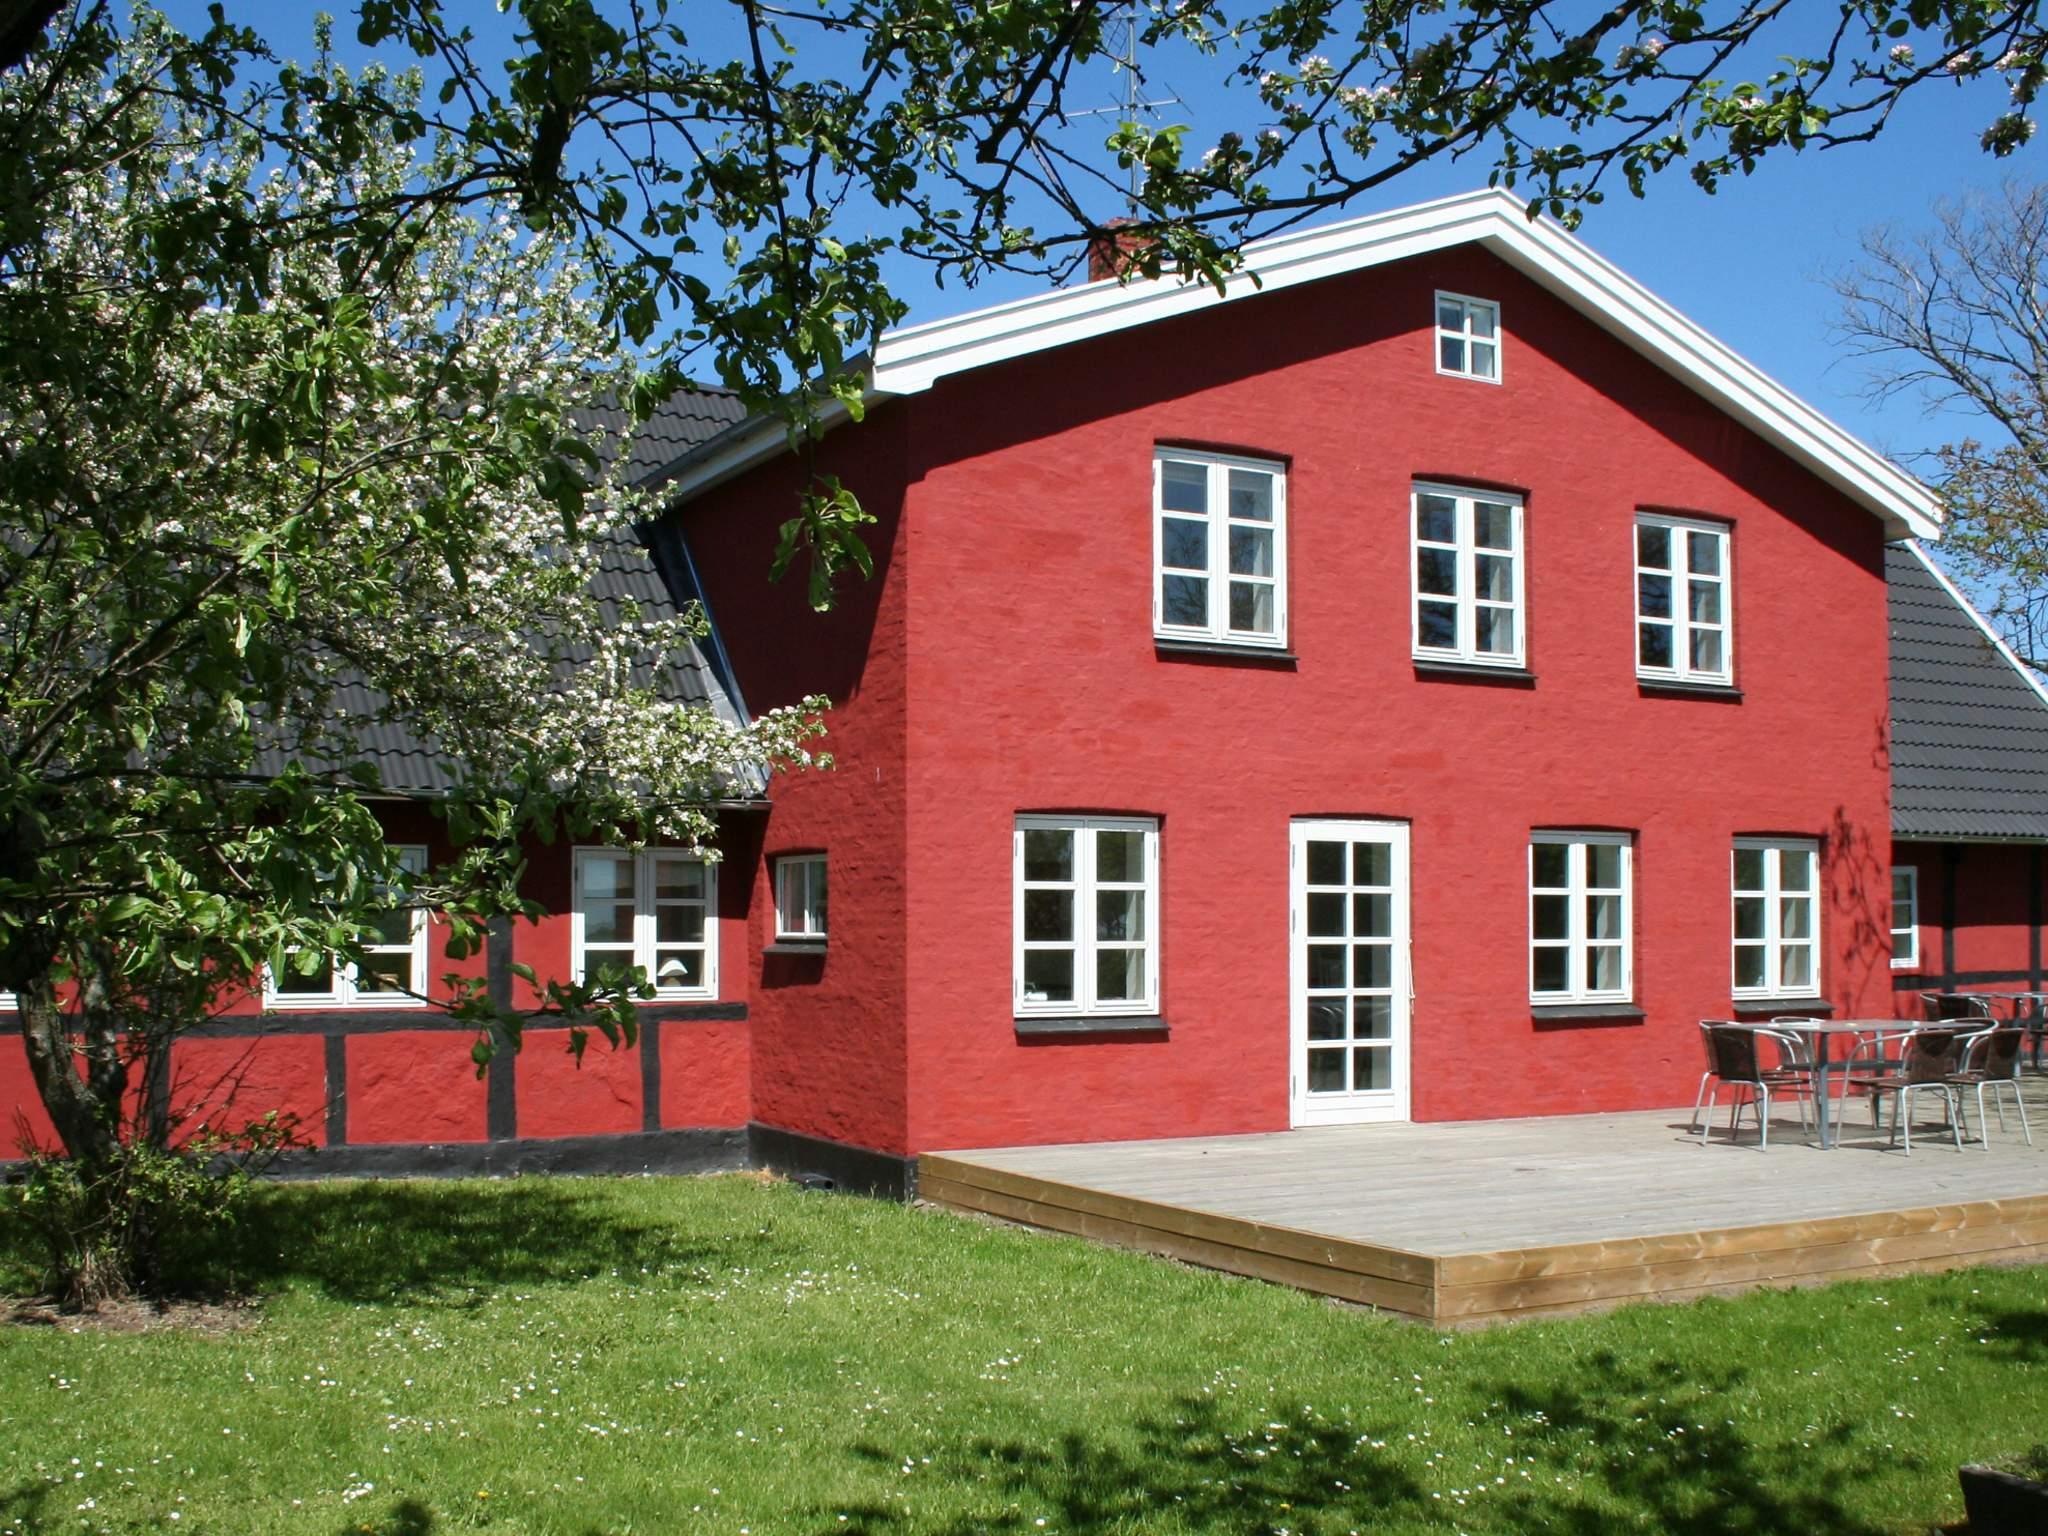 Ferienhaus Balka Strand (250432), Balke, , Bornholm, Dänemark, Bild 24